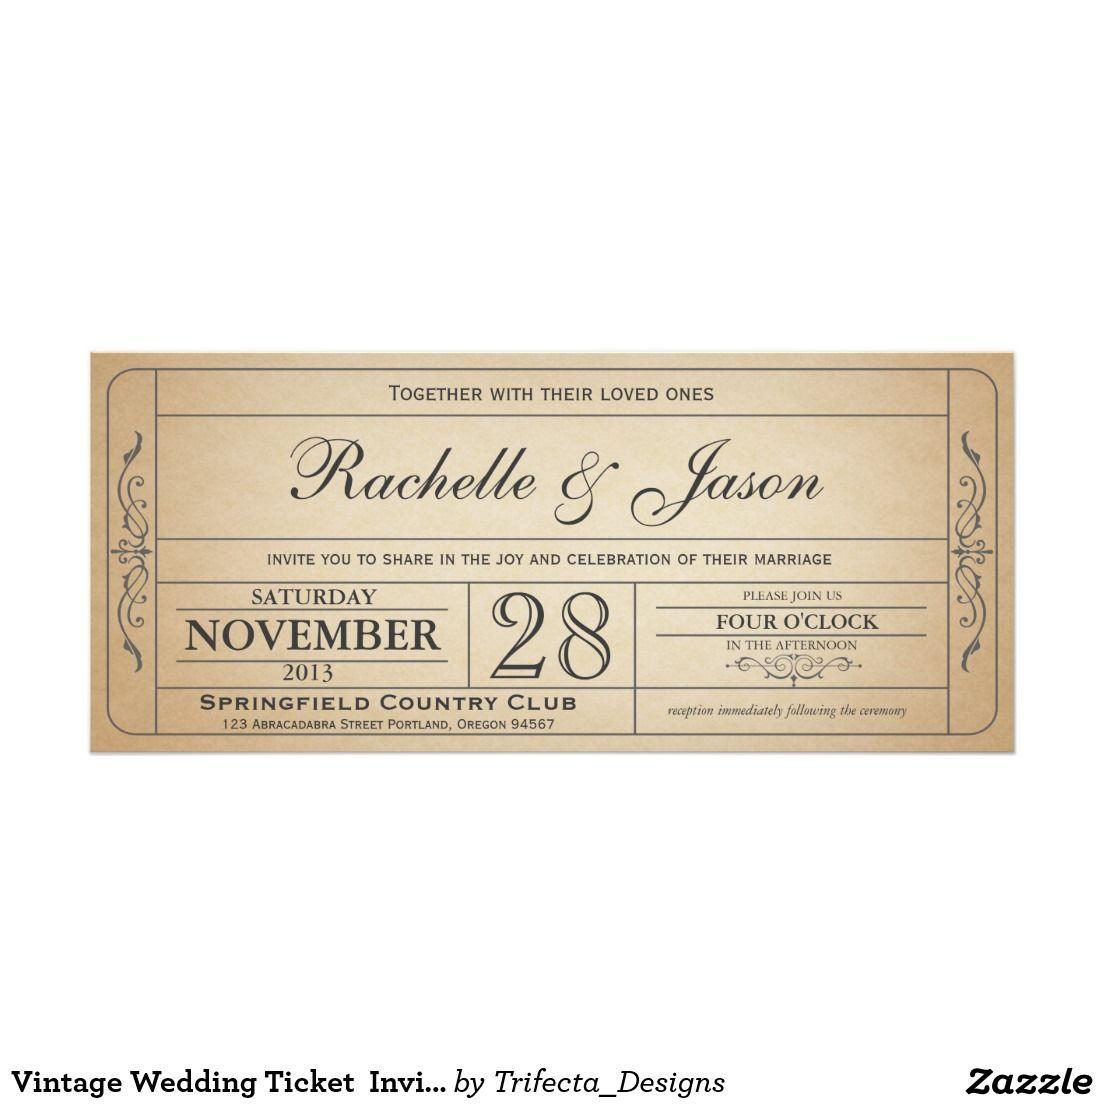 Invitation Vintage De Billet De Mariage Zazzle Fr With Images Photo Wedding Invitations Vintage Wedding Monogram Wedding Invitations